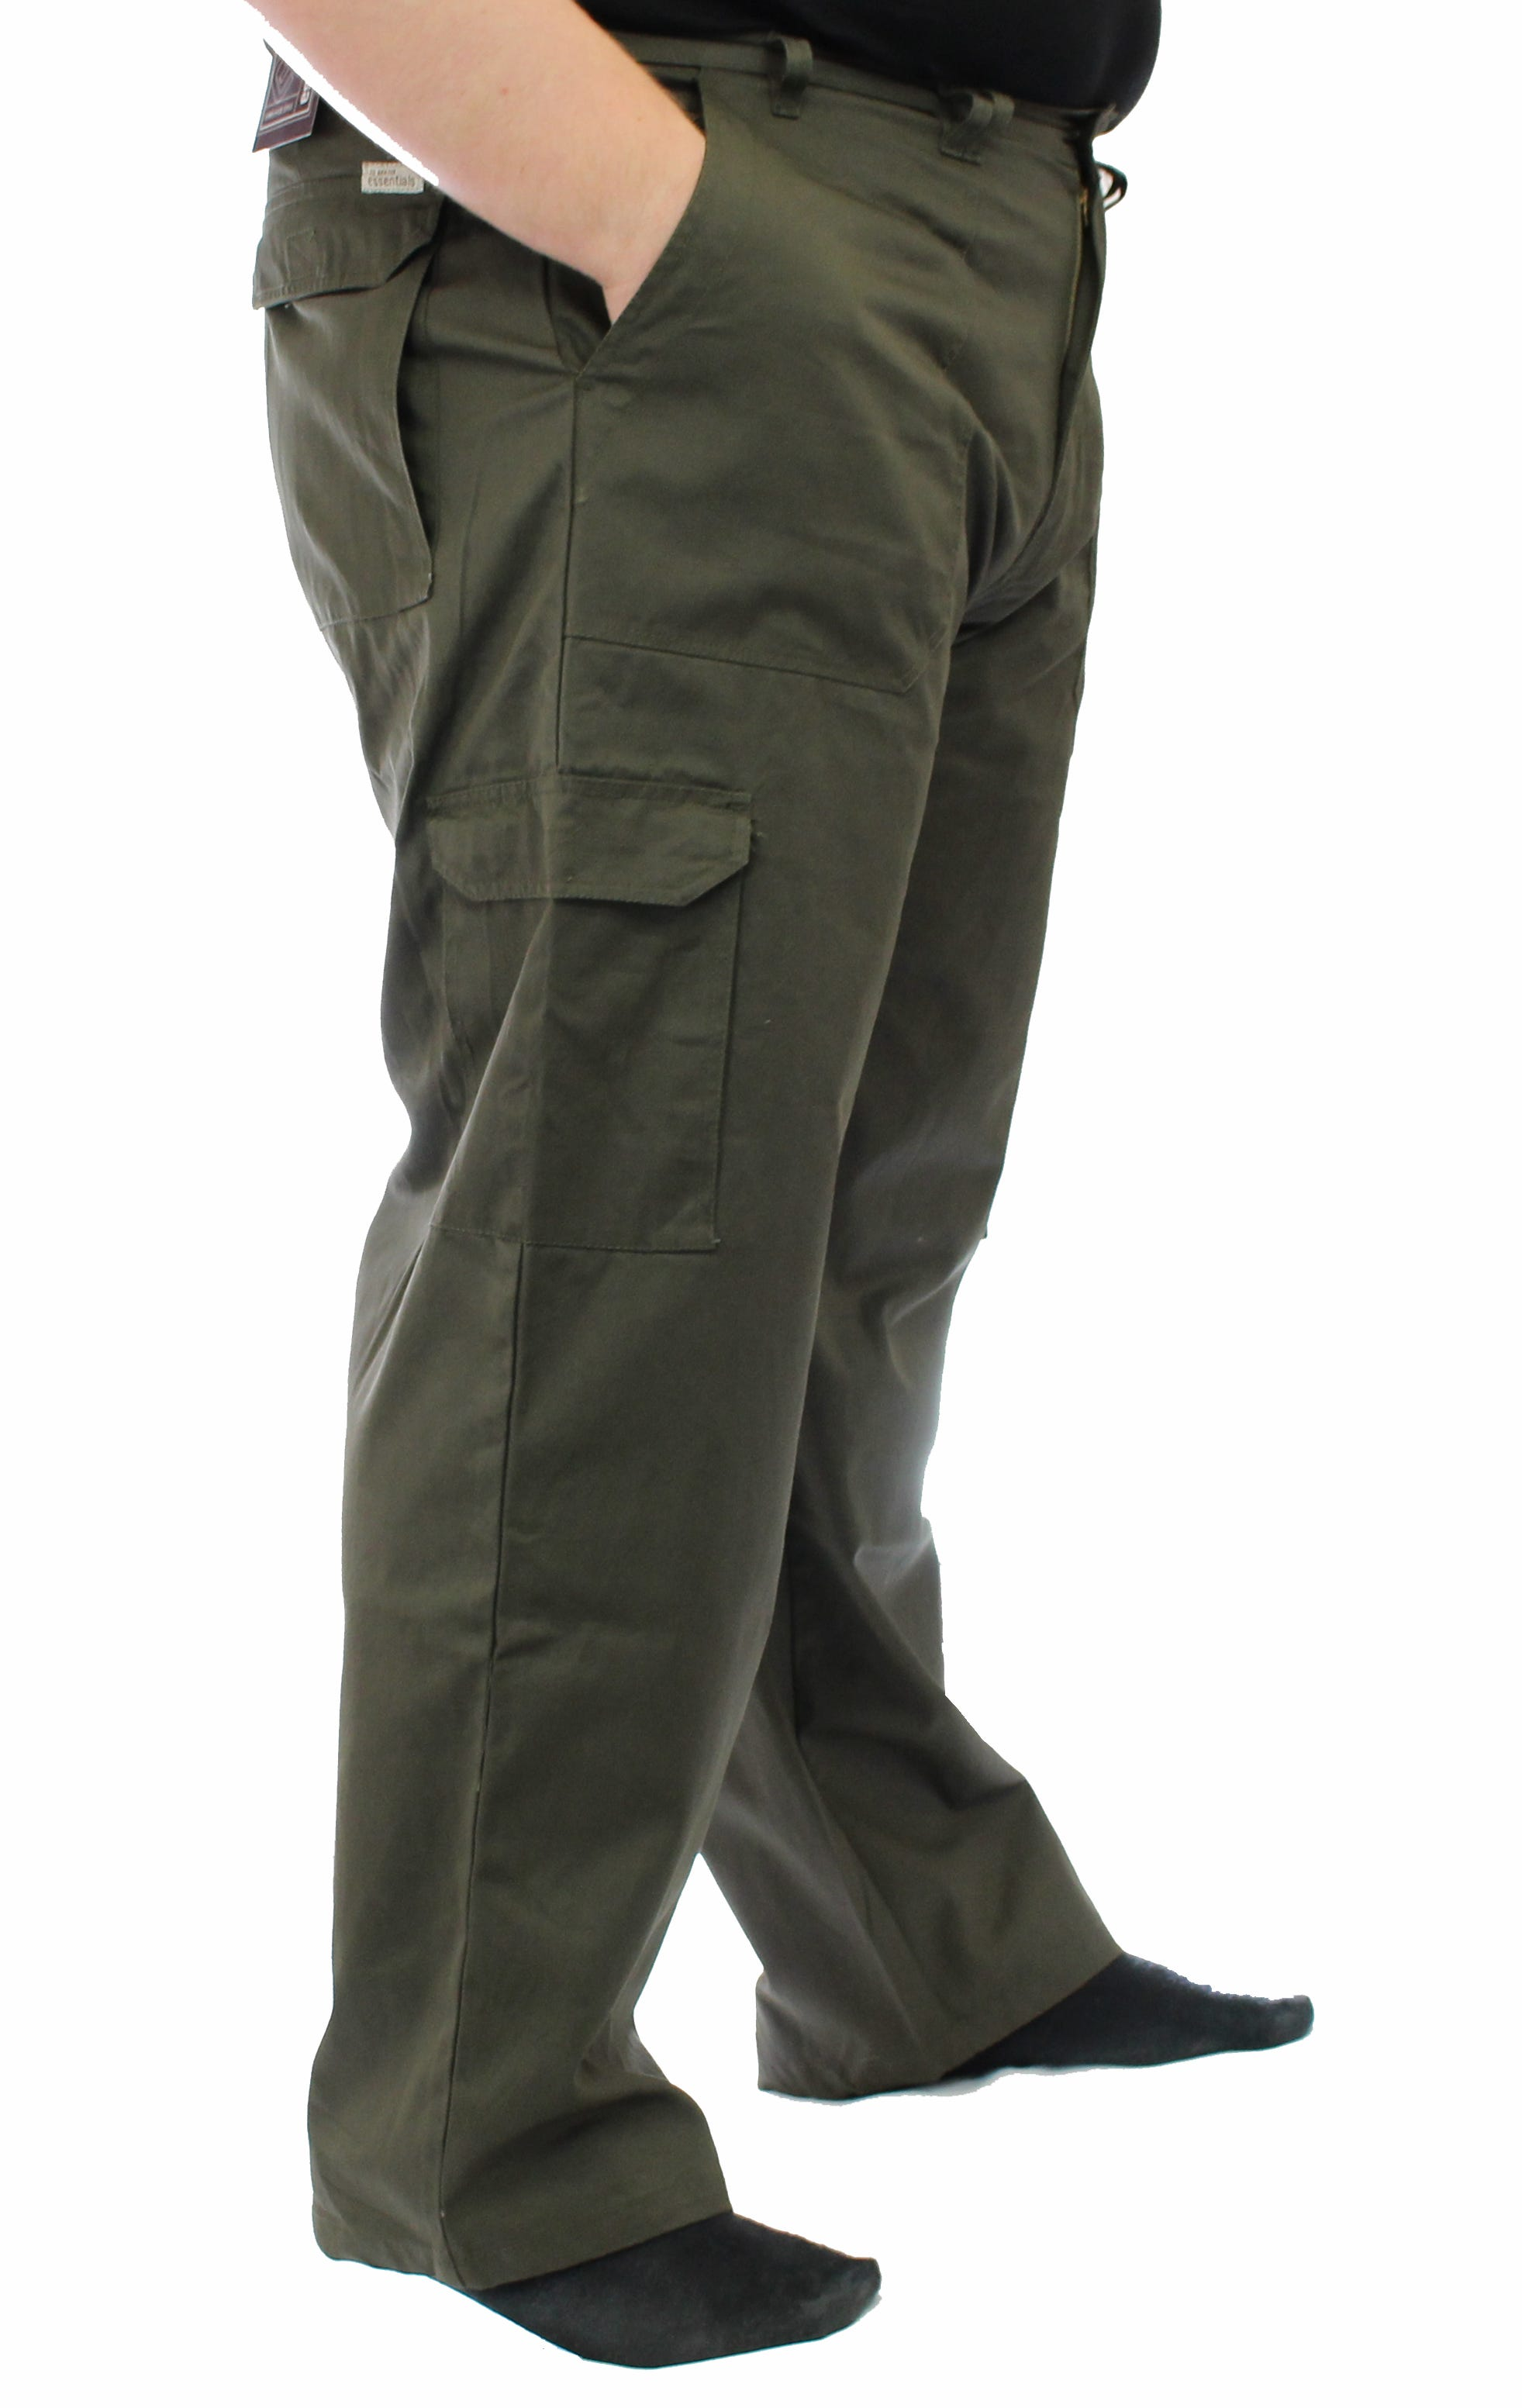 "Ed Baxter Victory - Heavy Duty Cargo Combat Trousers - Khaki - 46"" Waist, 34"" Leg"